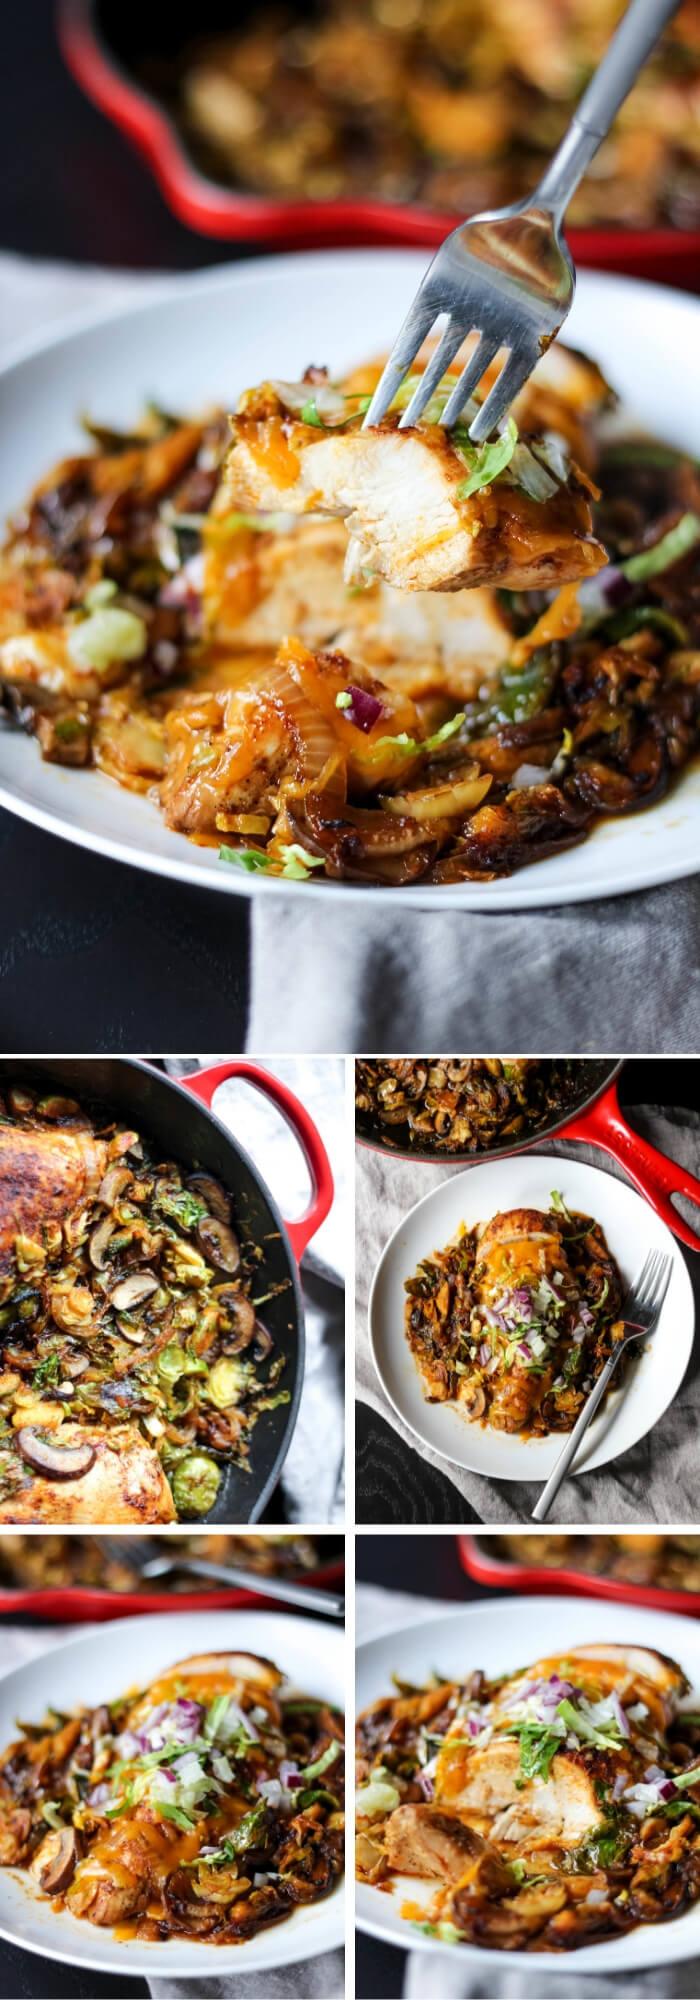 Chicken Enchilada Bake | Nutritious Keto & Low Carb Casserole Recipes | heall